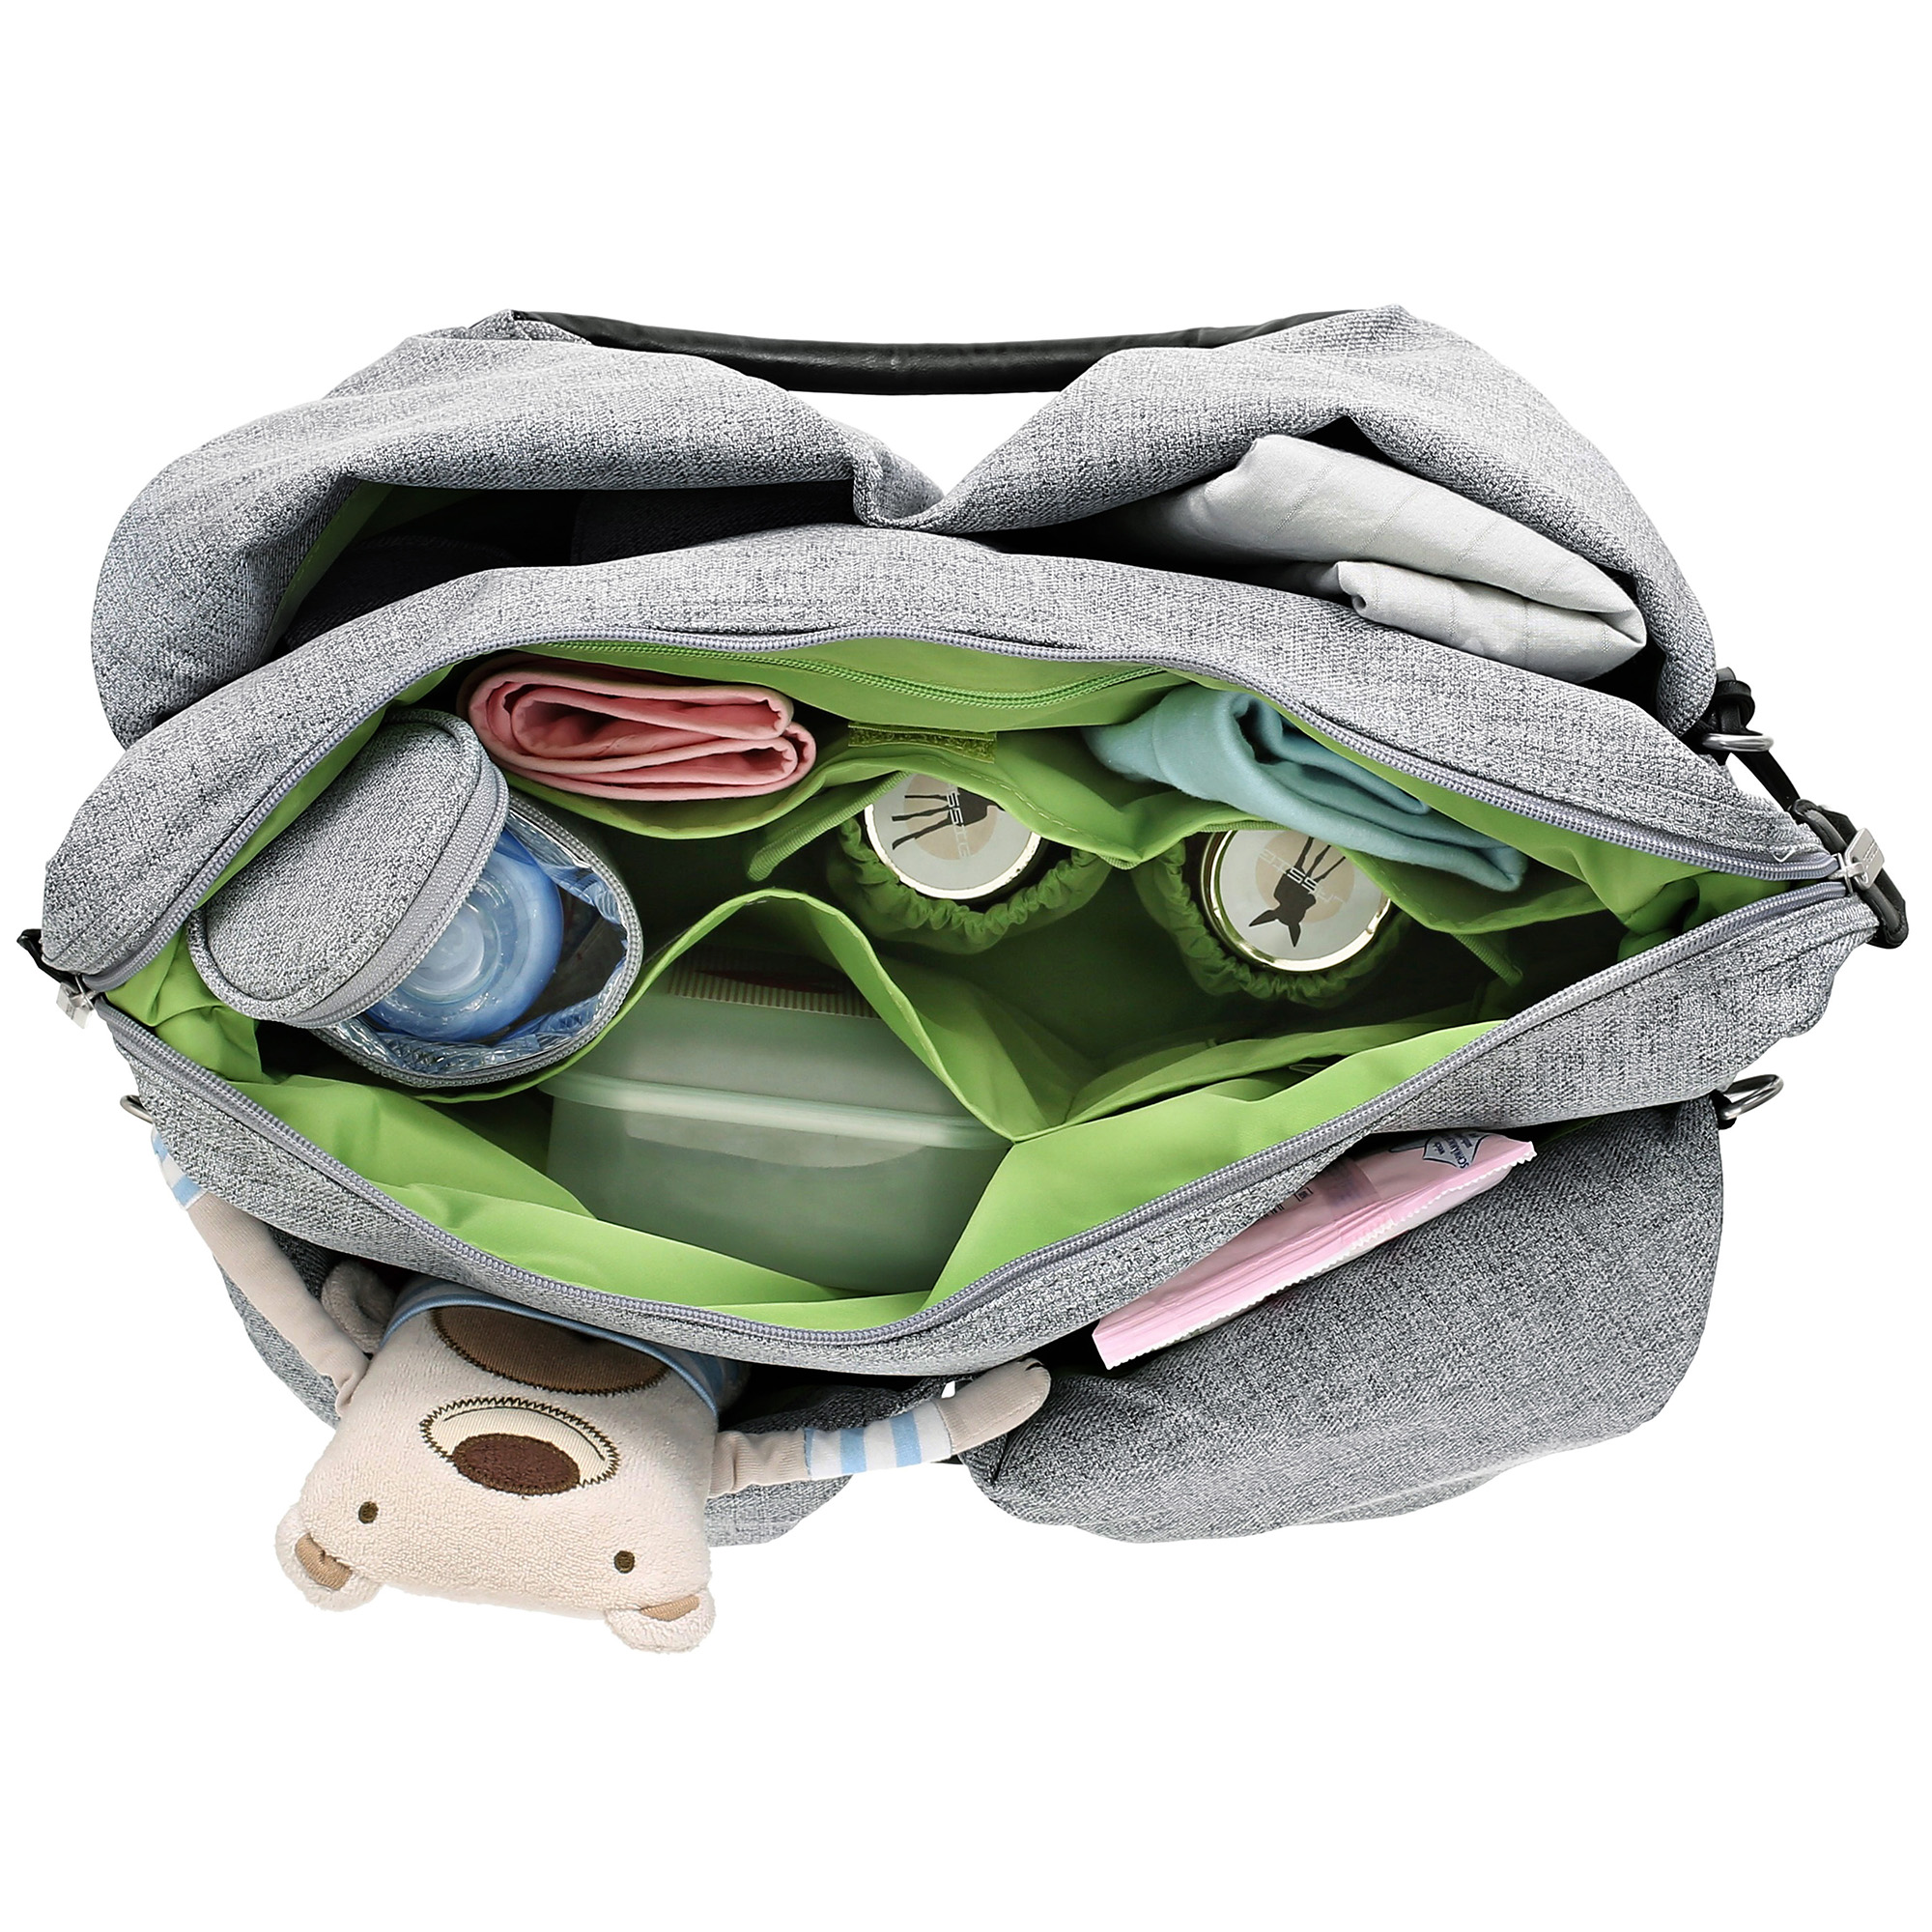 laessig-4family-green-neckline-bag5%20-%